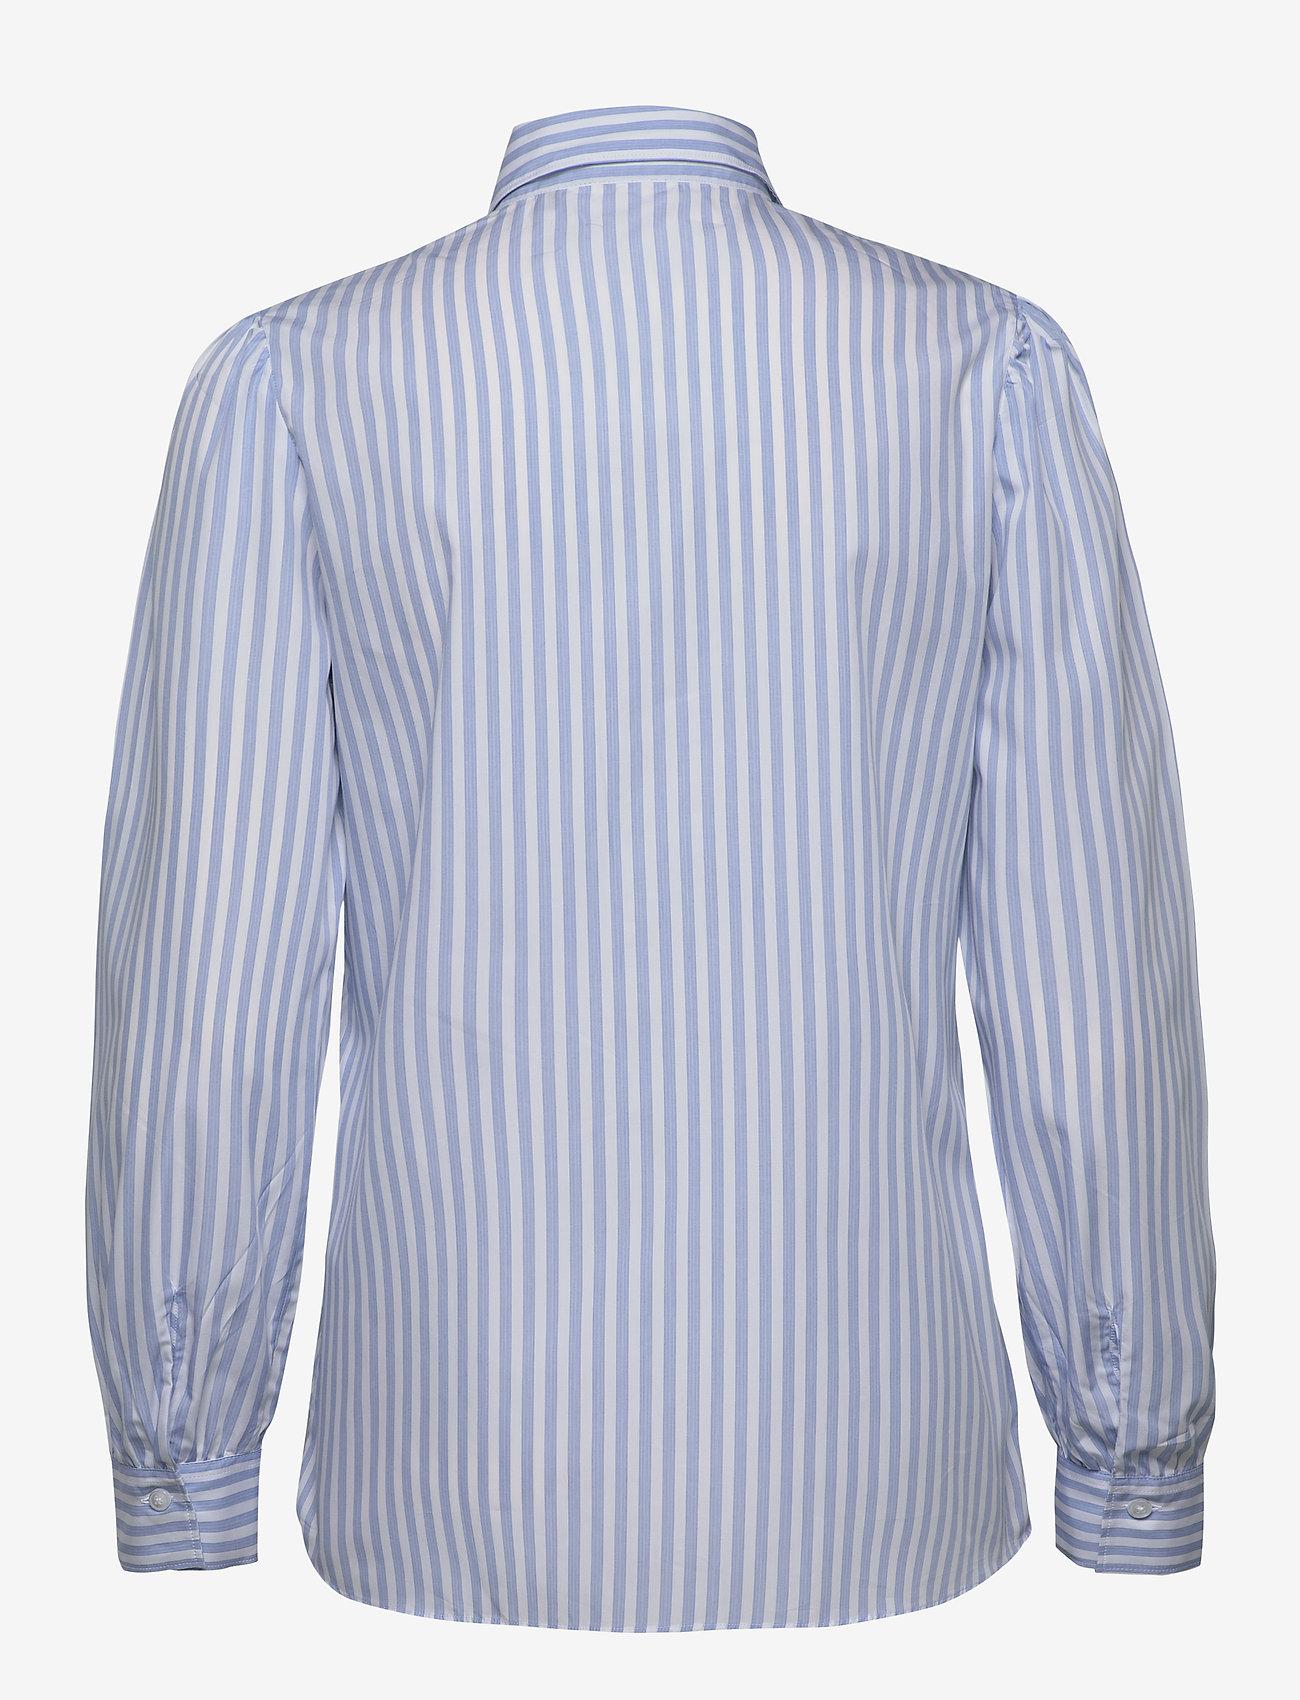 SAND - 8750 - Loreto - chemises à manches longues - ecru/light sand - 1